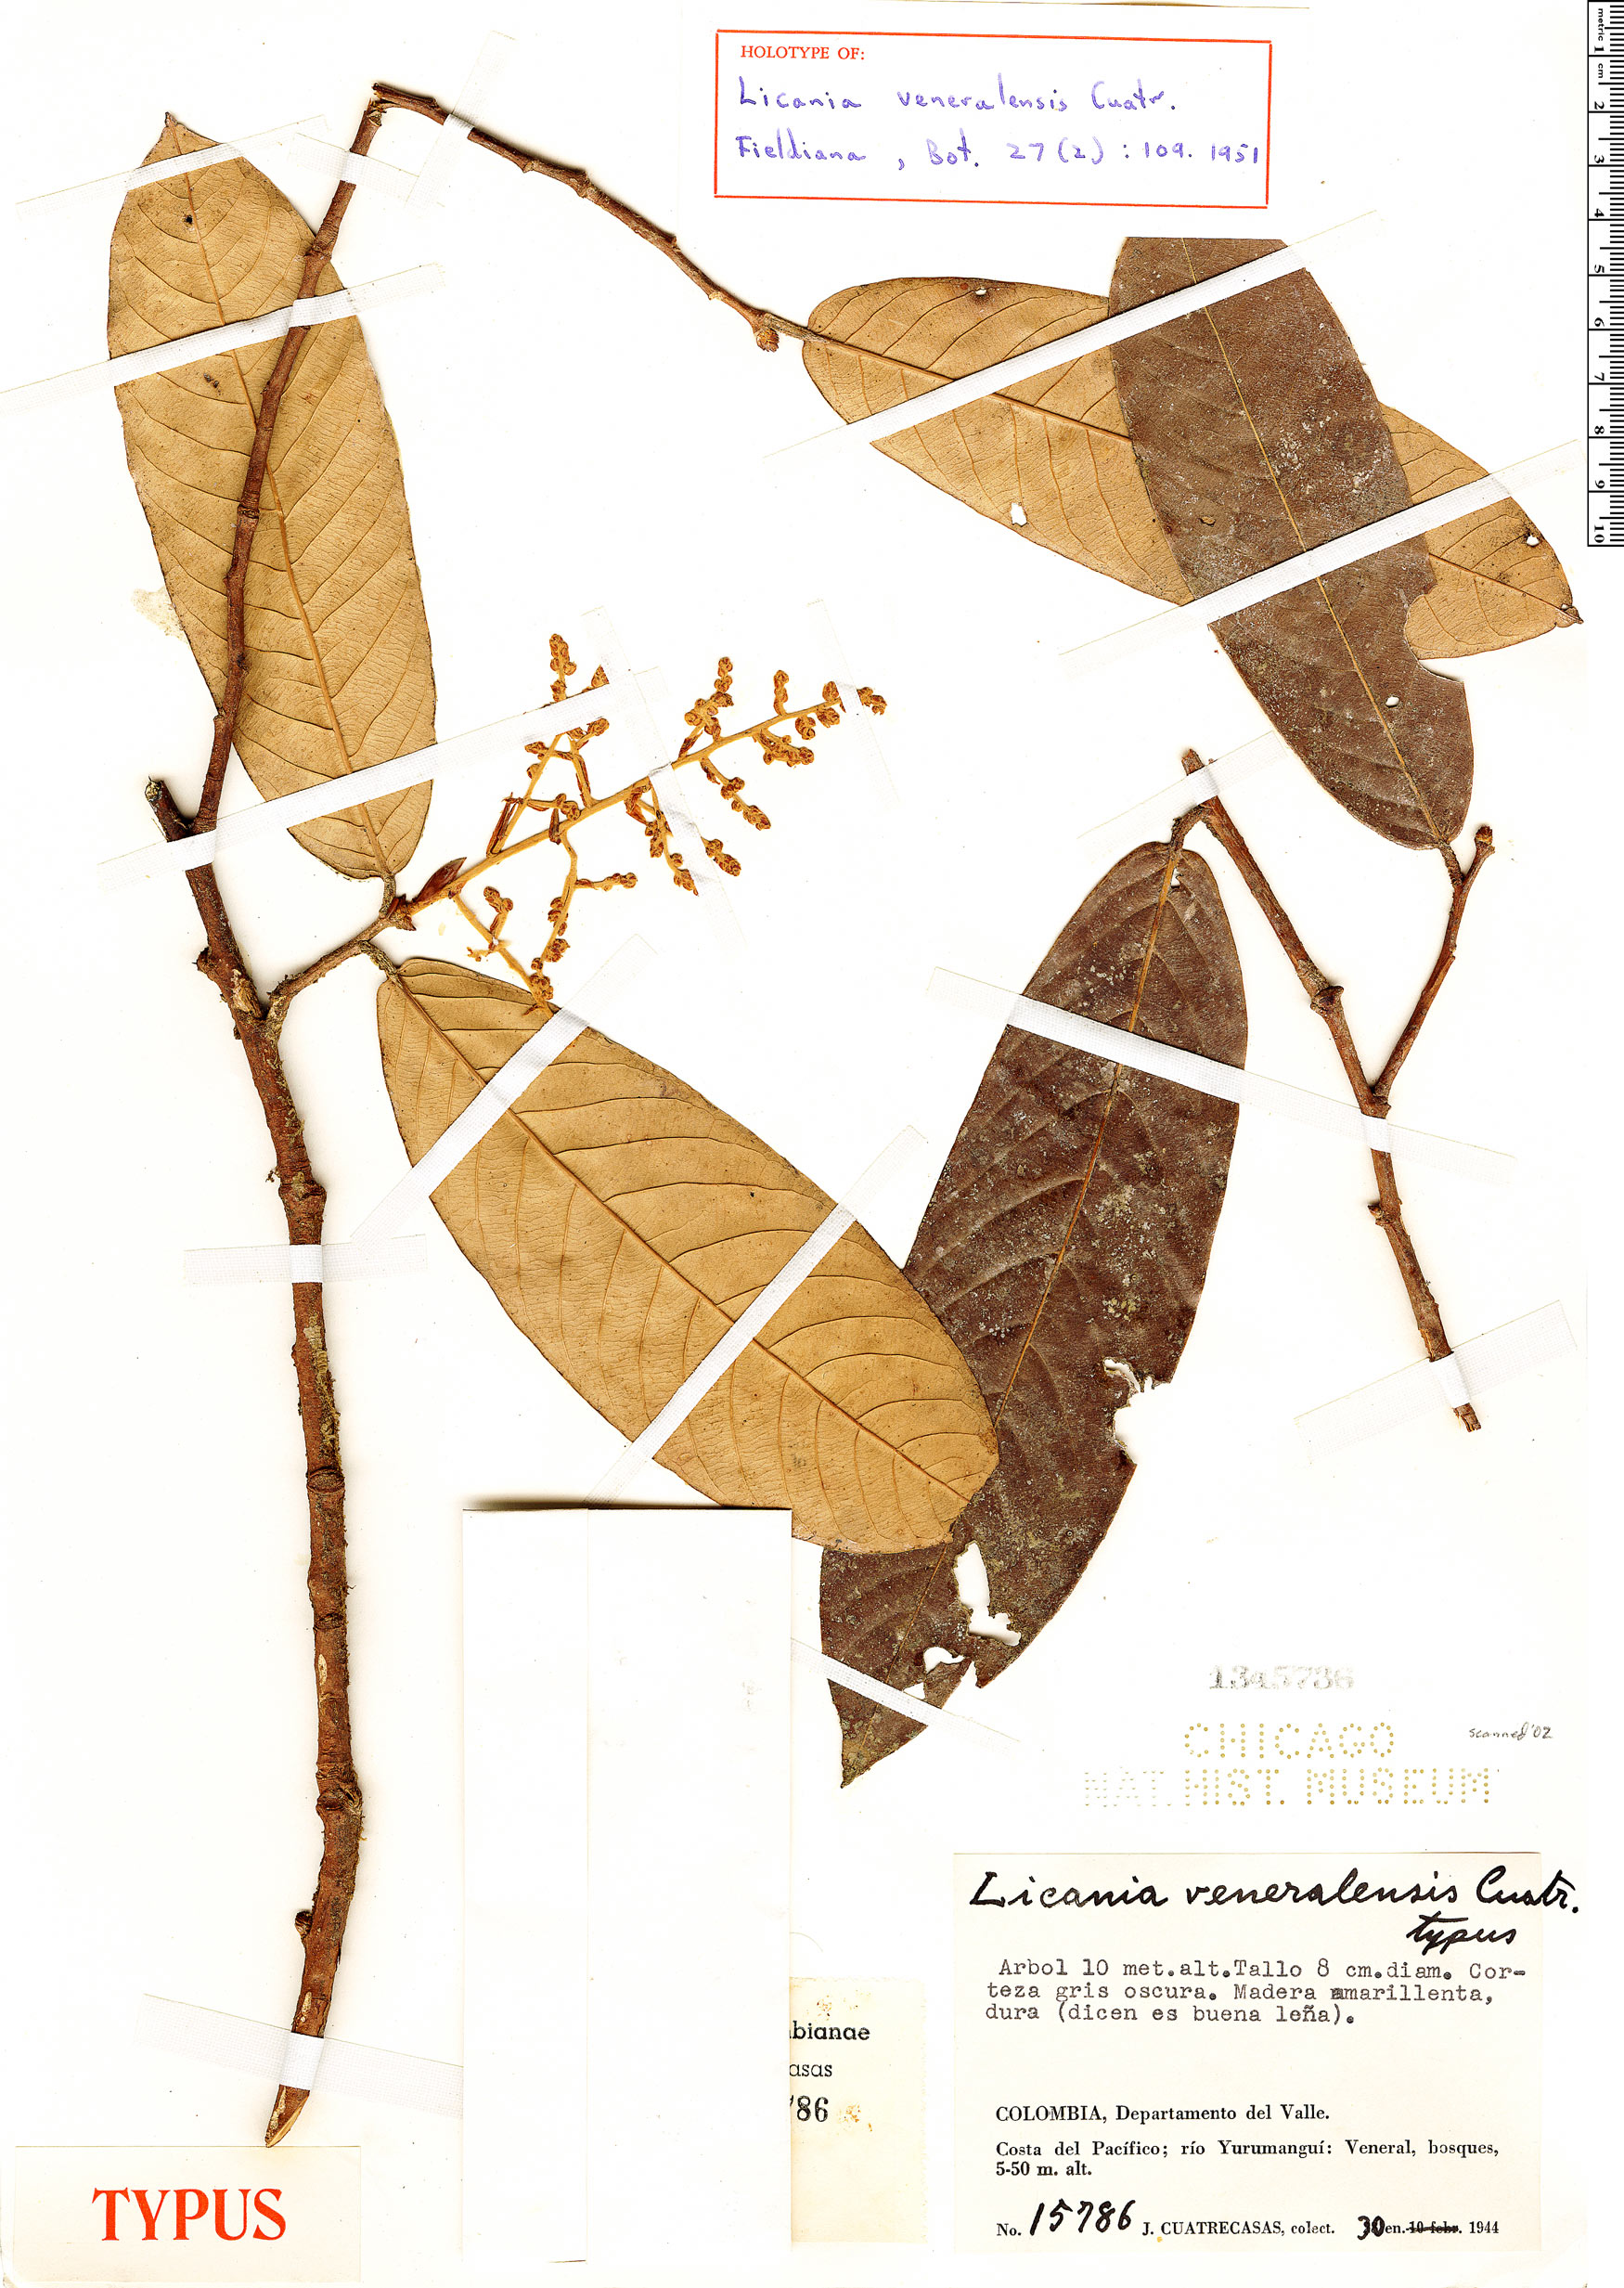 Specimen: Licania veneralensis